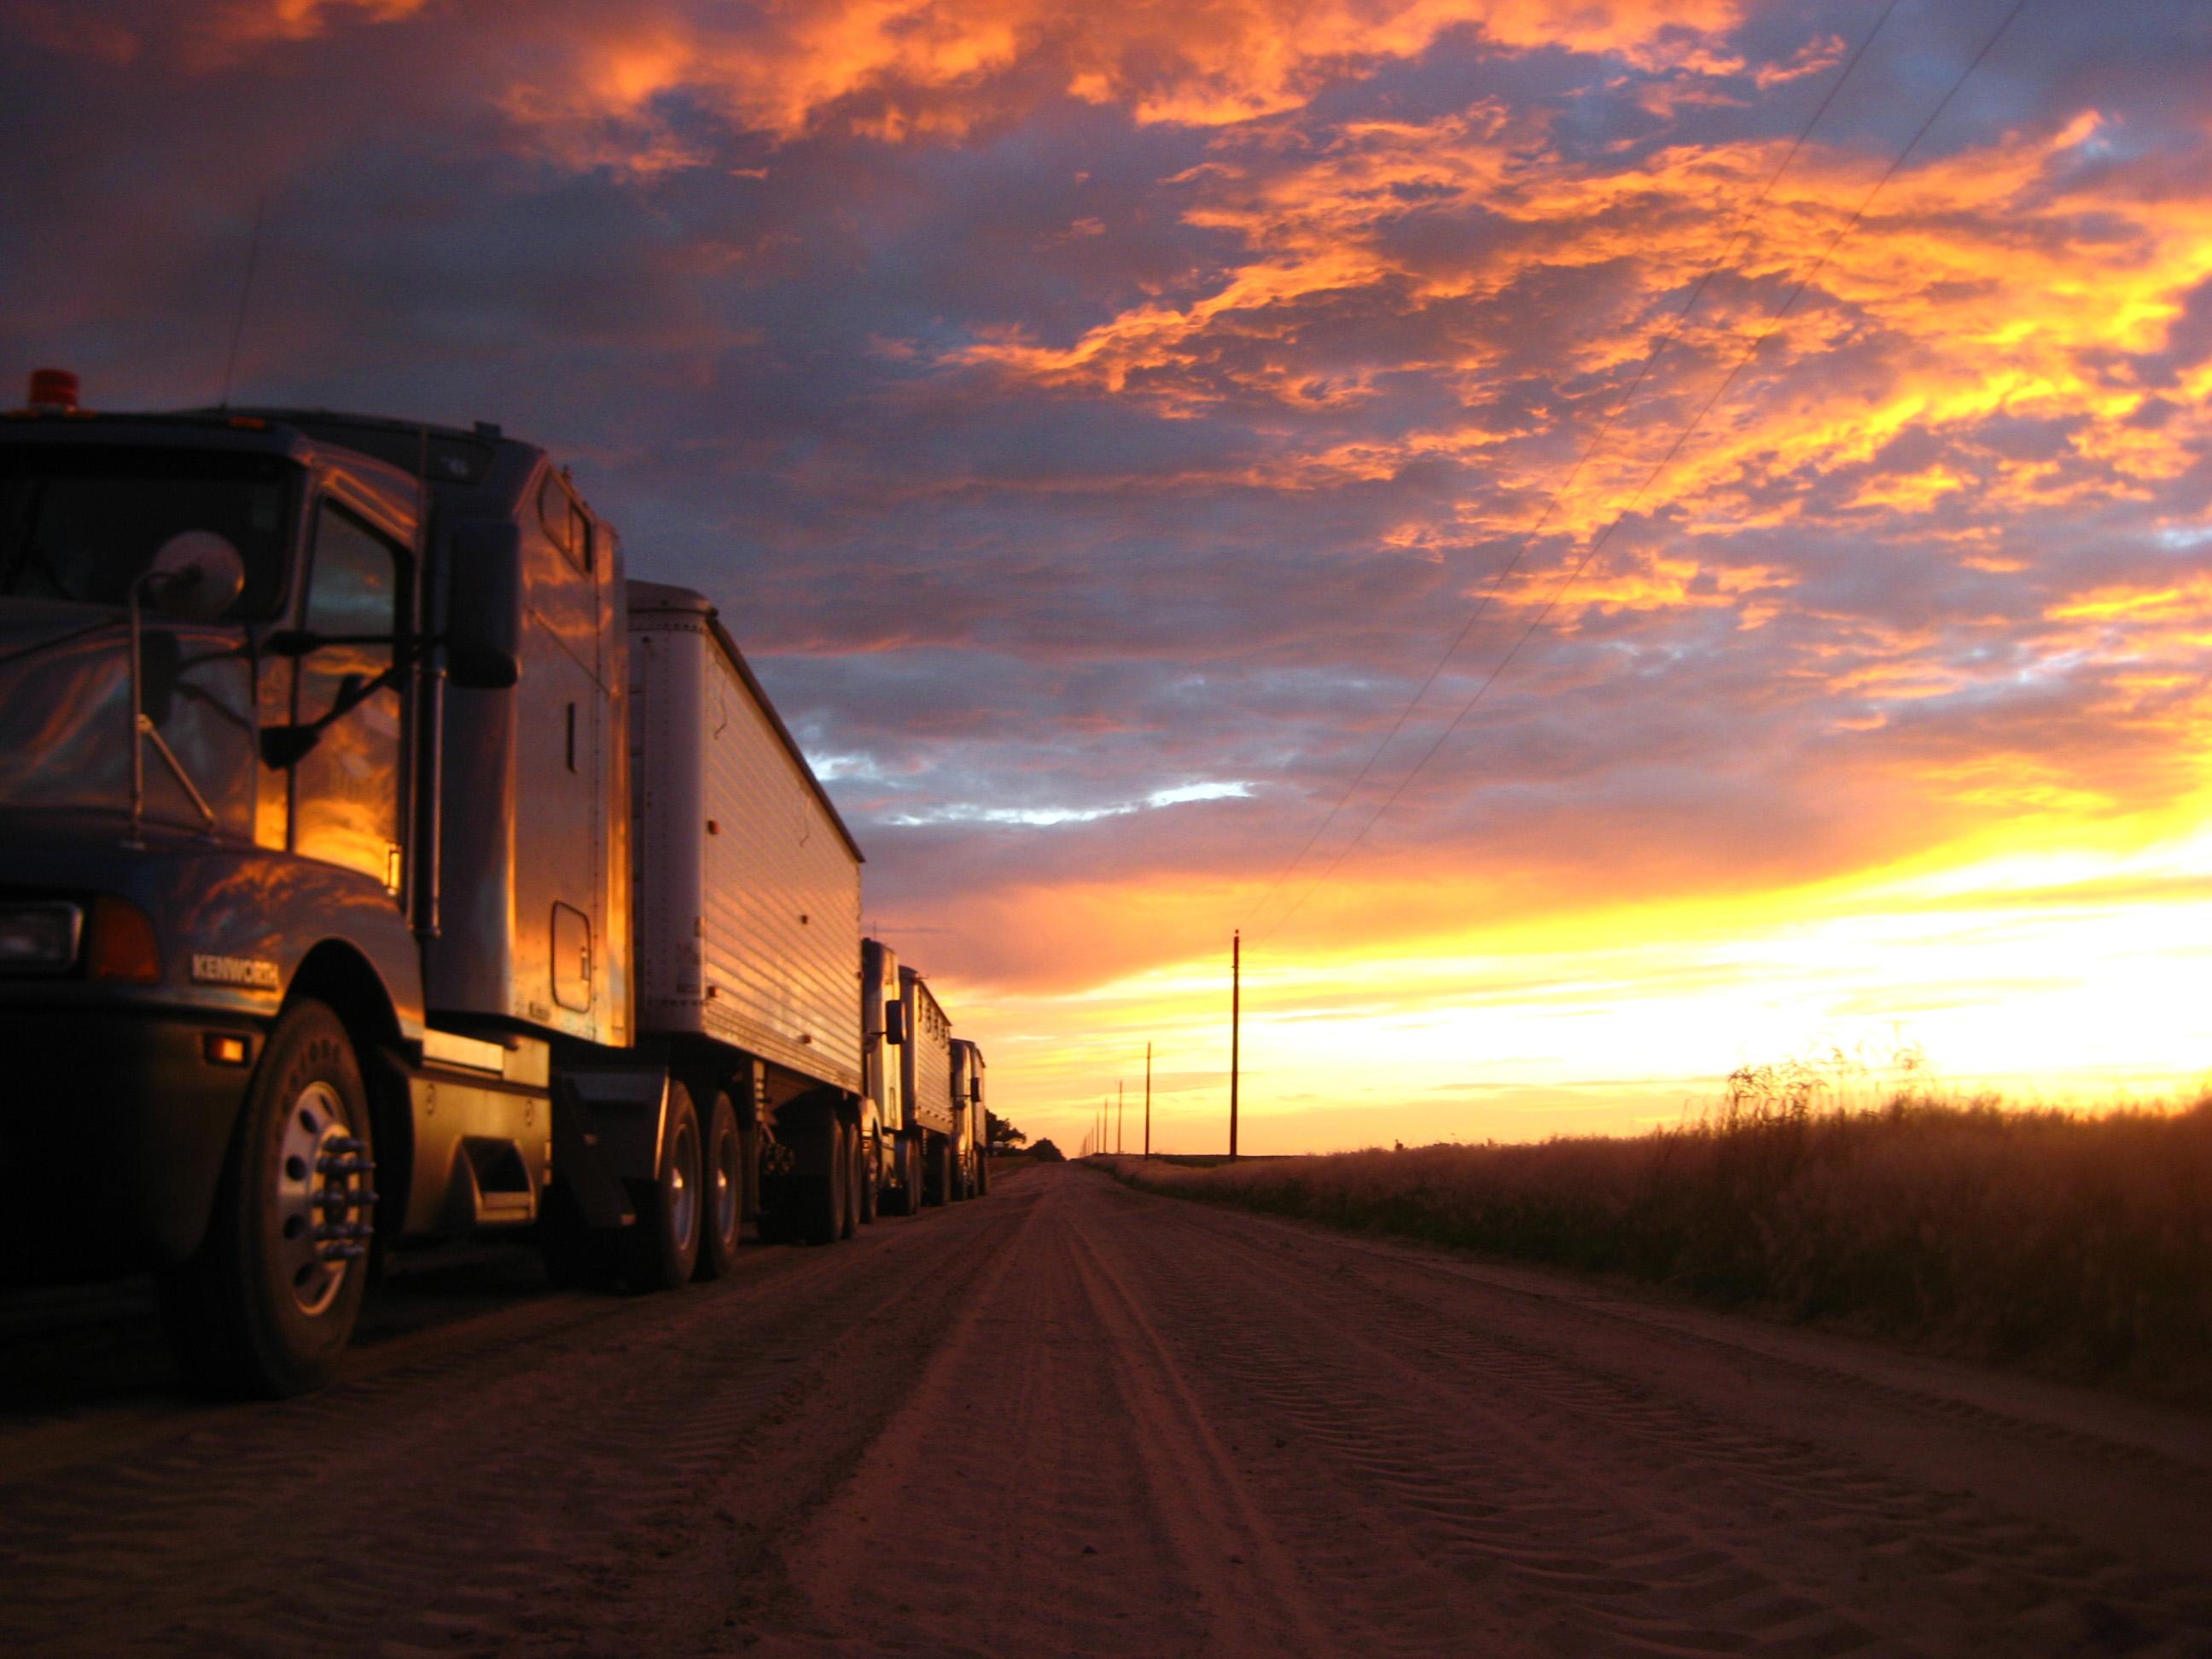 A beautiful sunset in Pratt KS